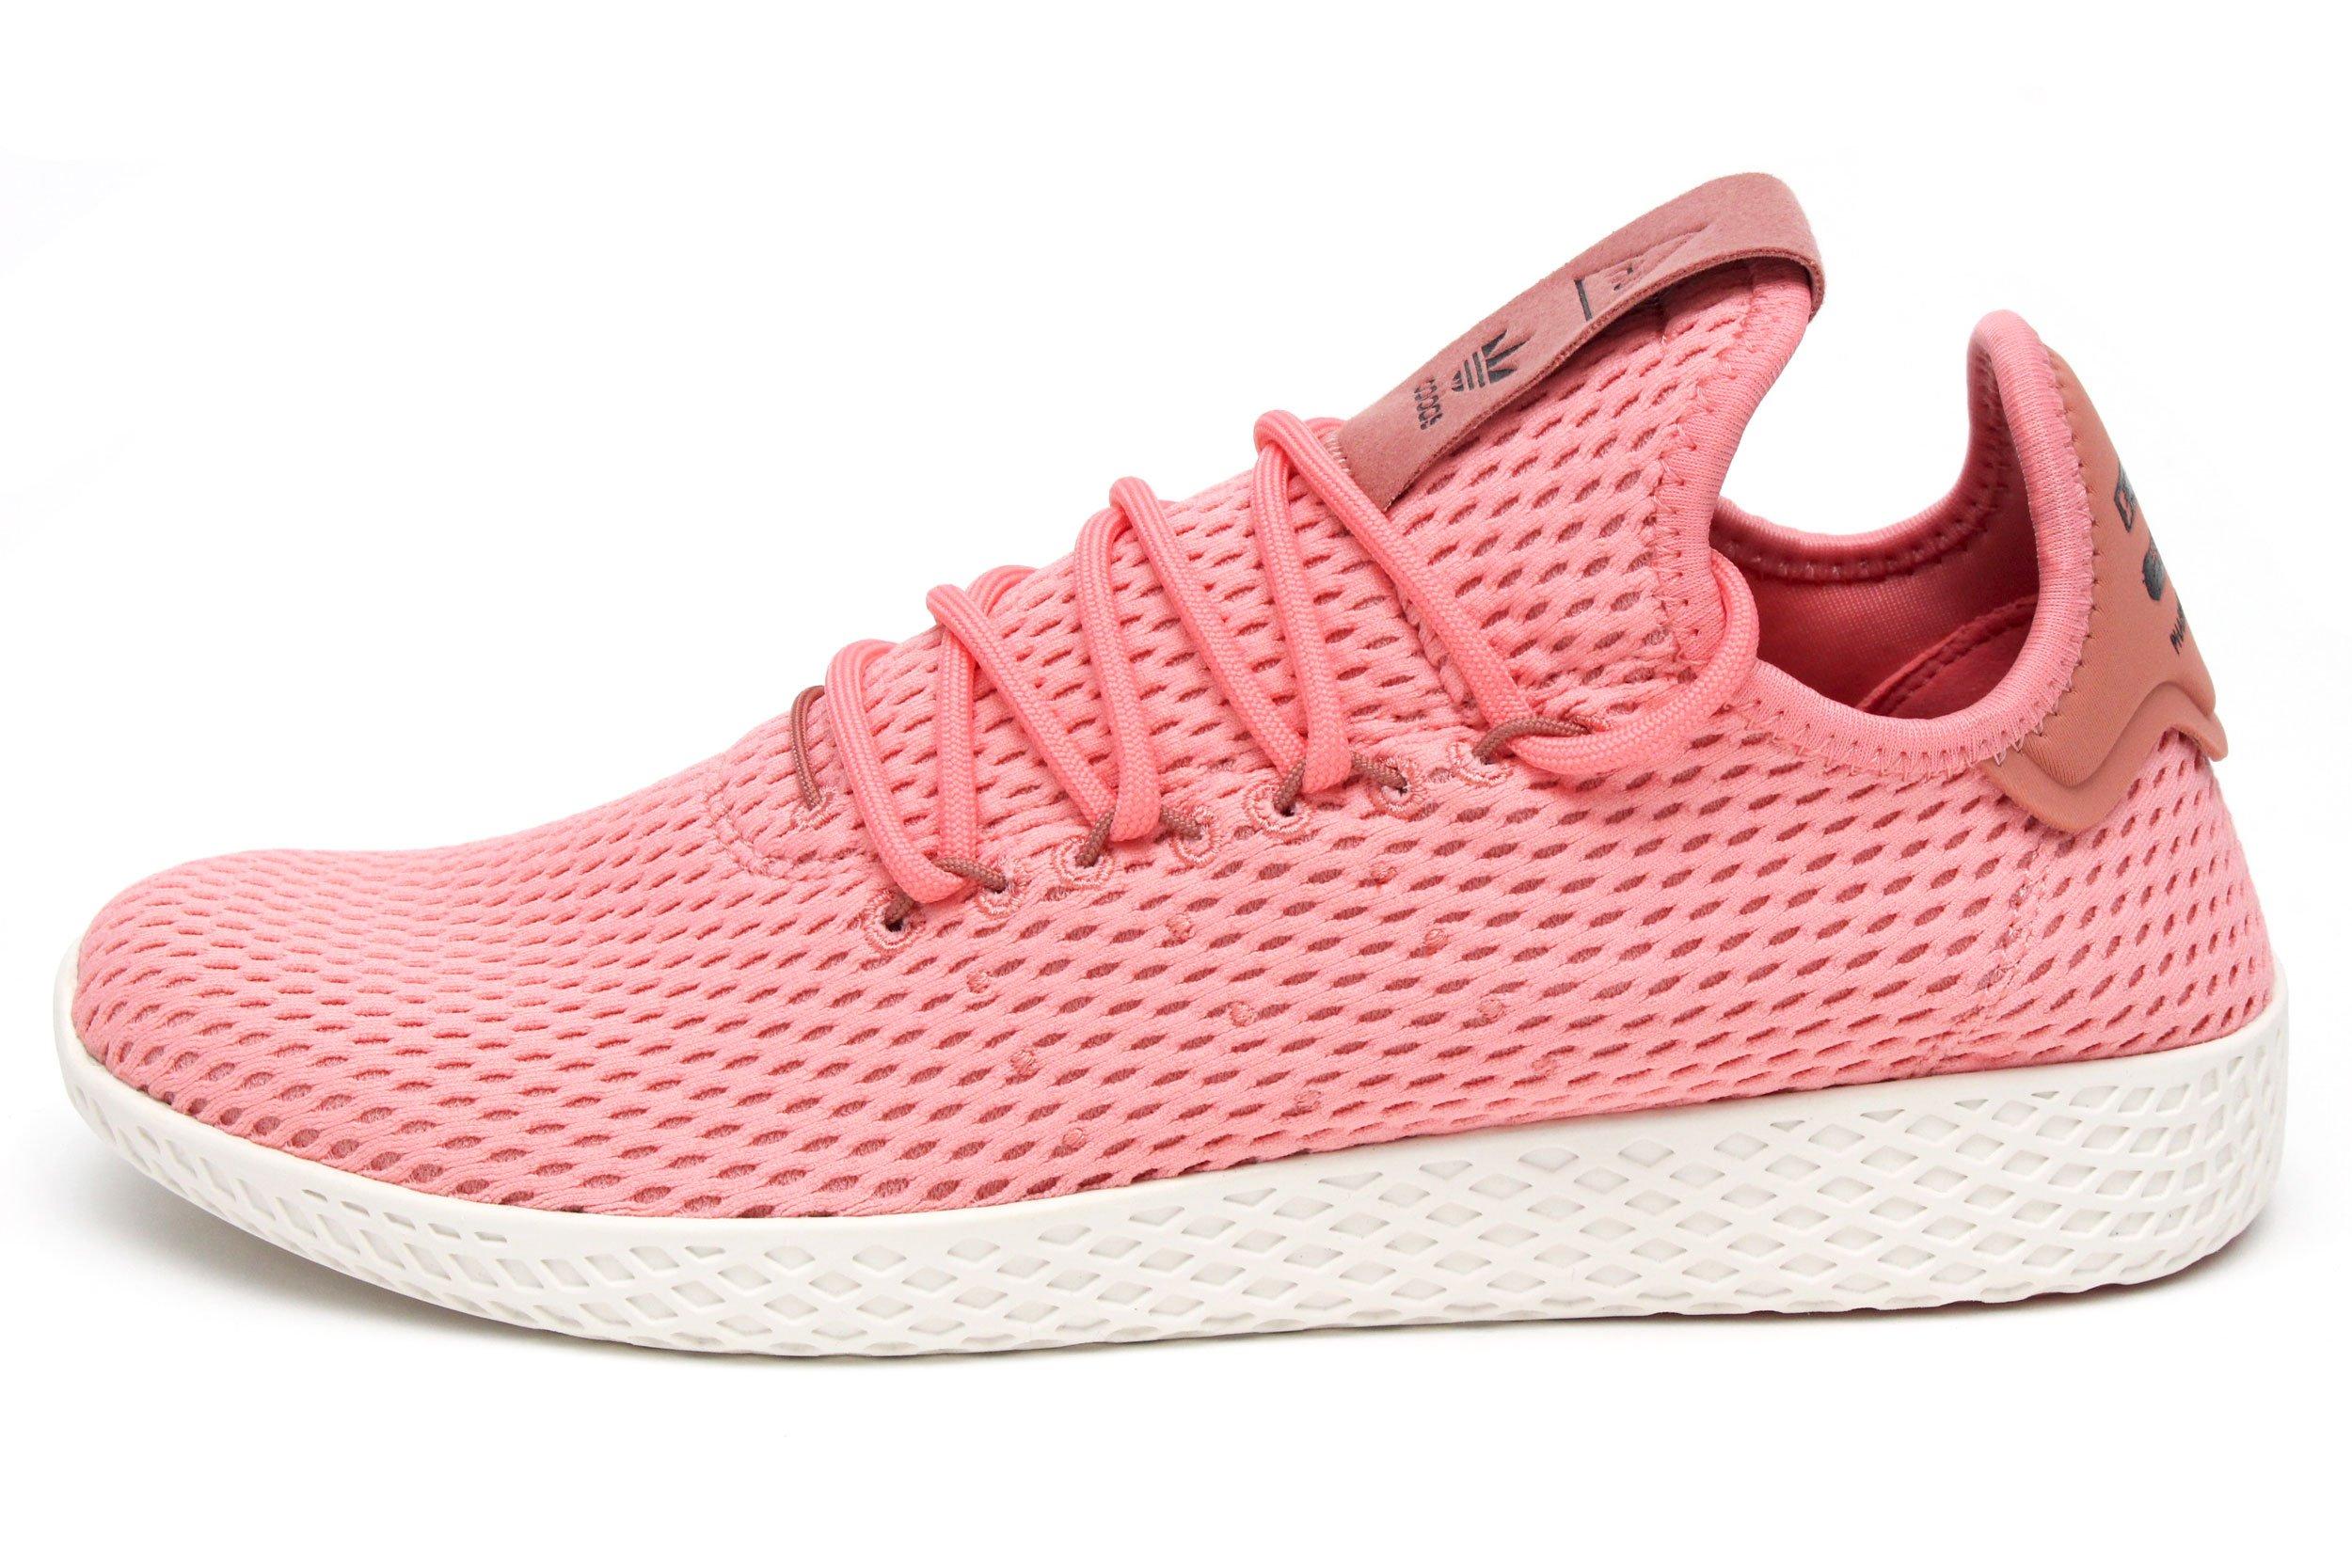 adidas PW Tennis Hu in Tactile Rose/Raw Pink, 4 by adidas (Image #1)